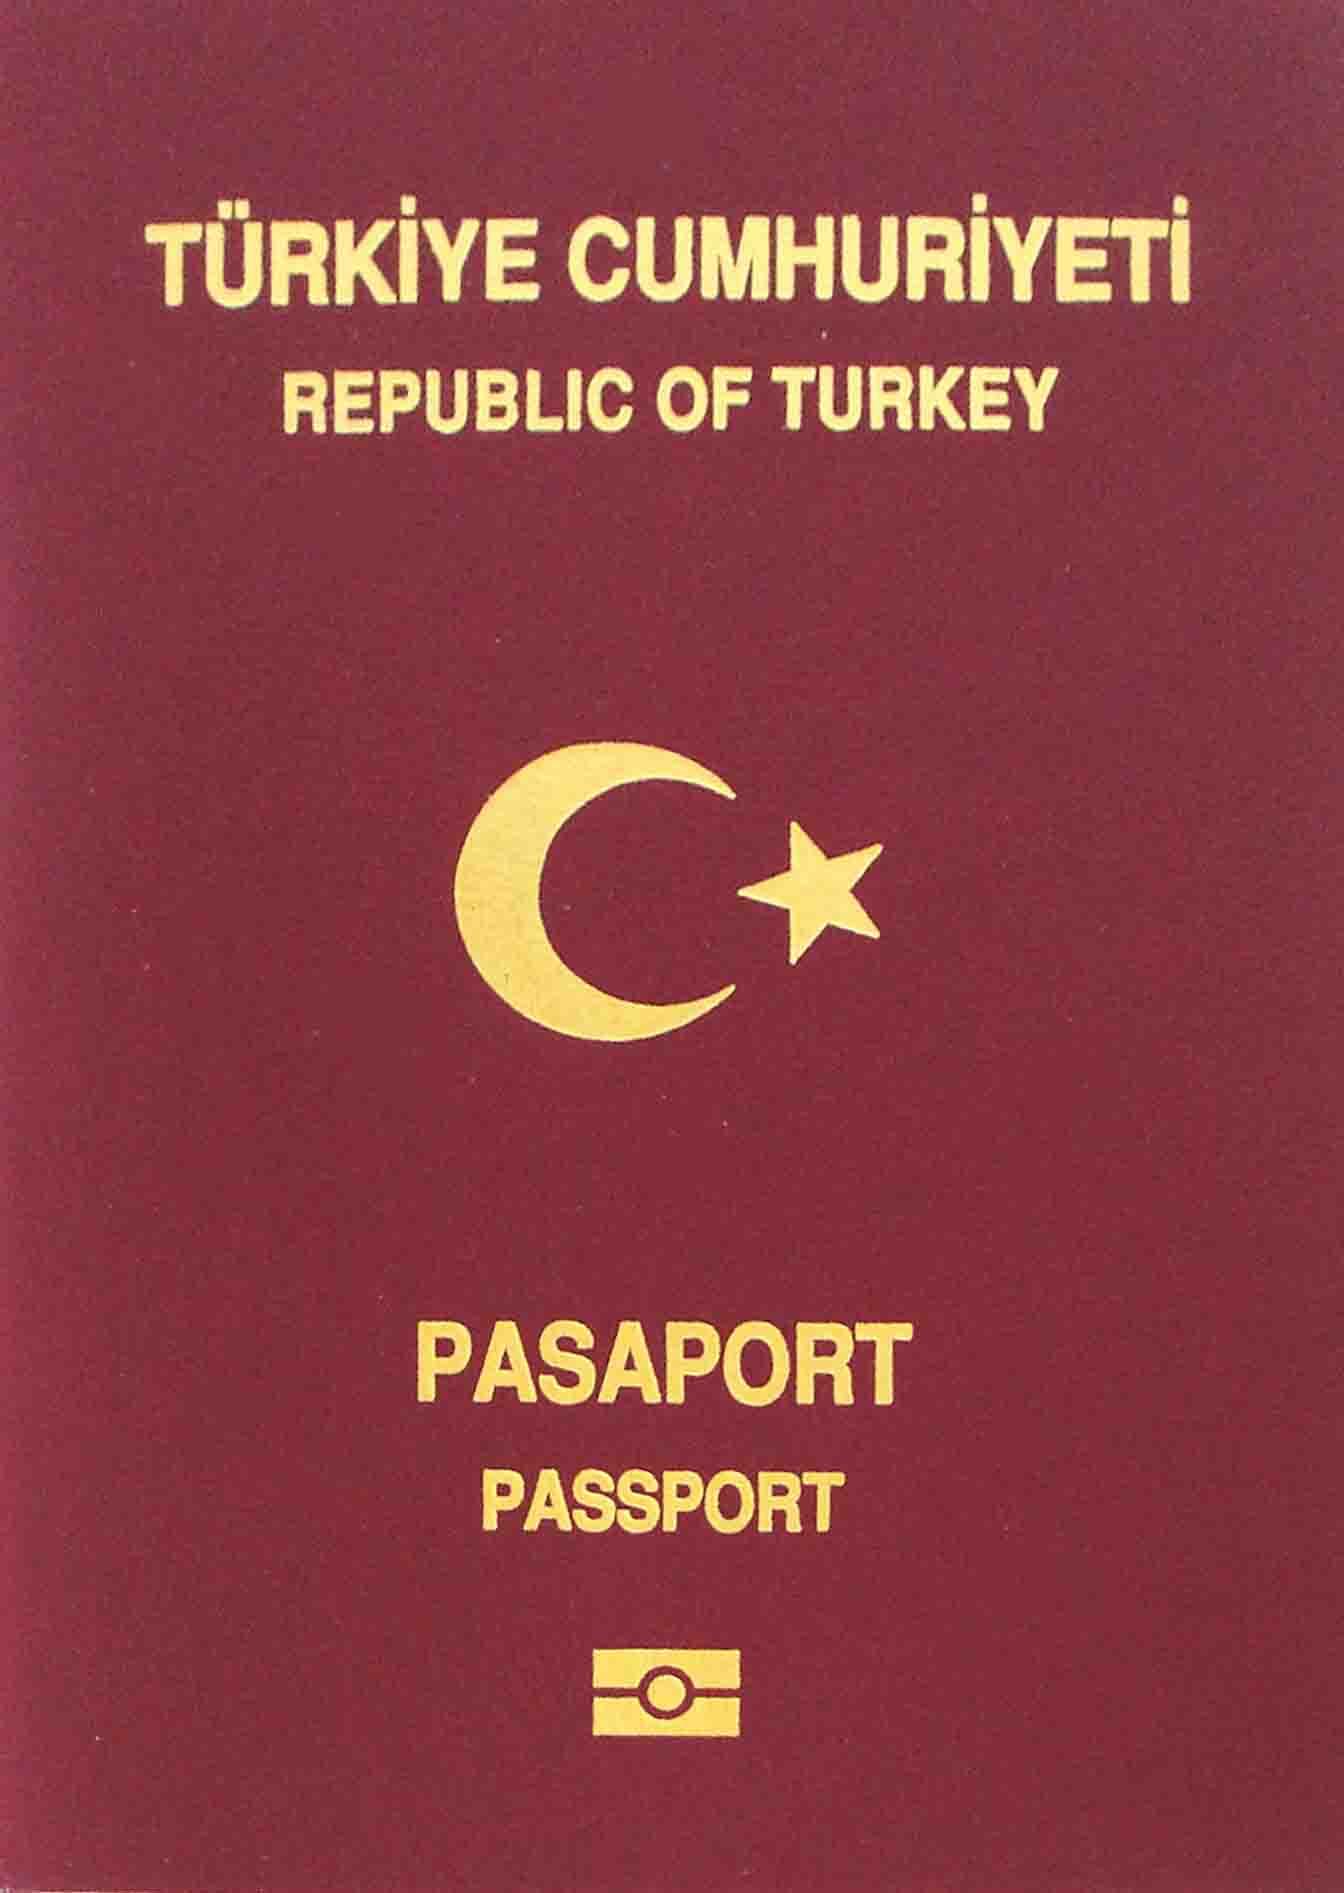 Passeport turc